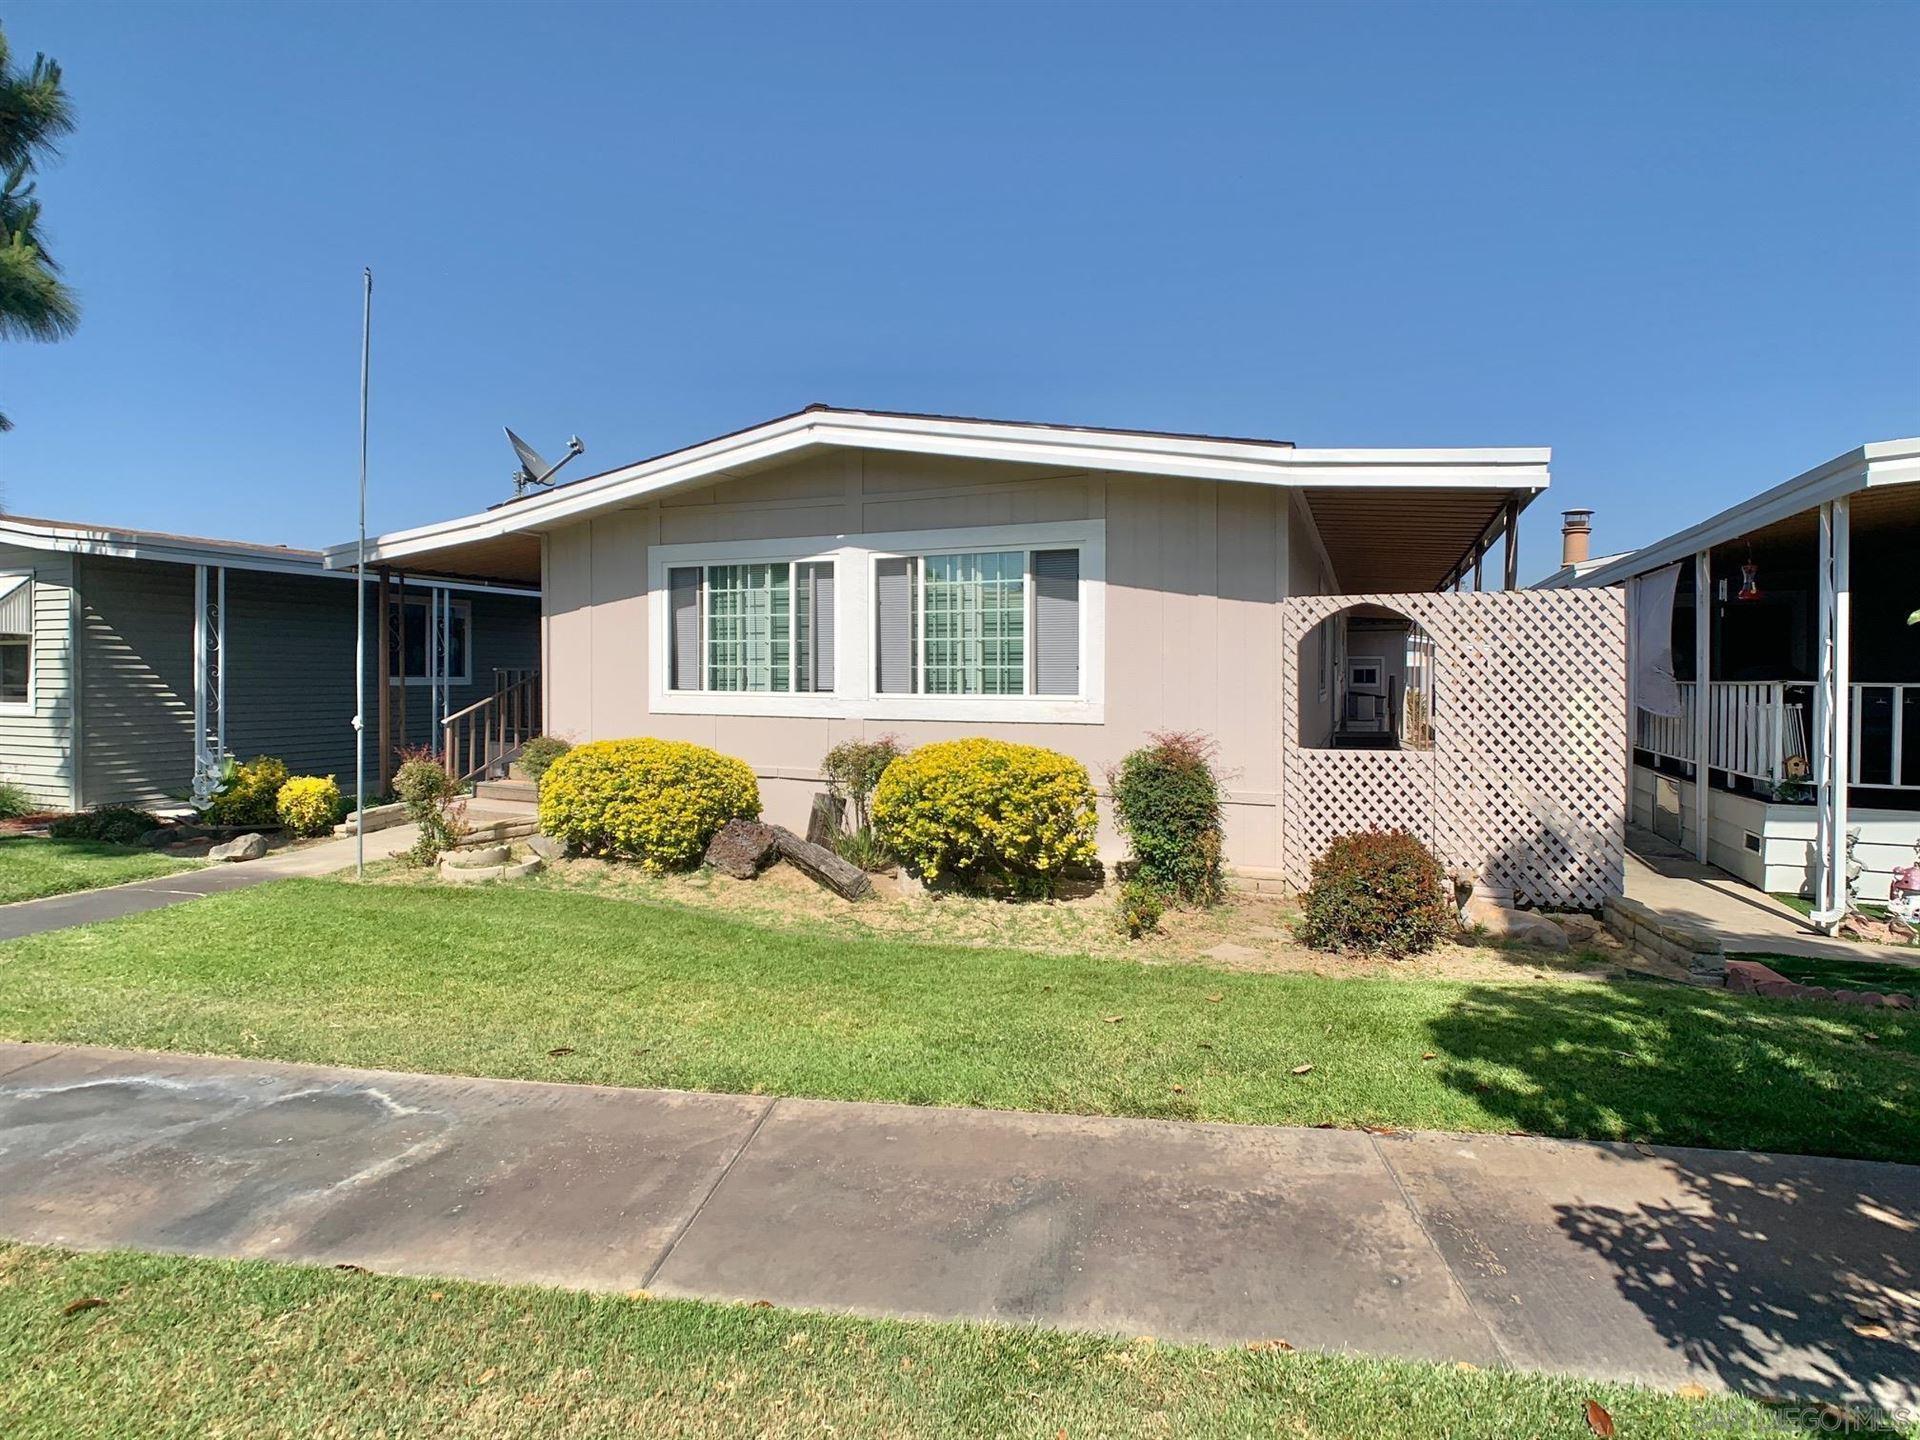 Photo of 9255 N Magnolia #88, Santee, CA 92071 (MLS # 210025369)